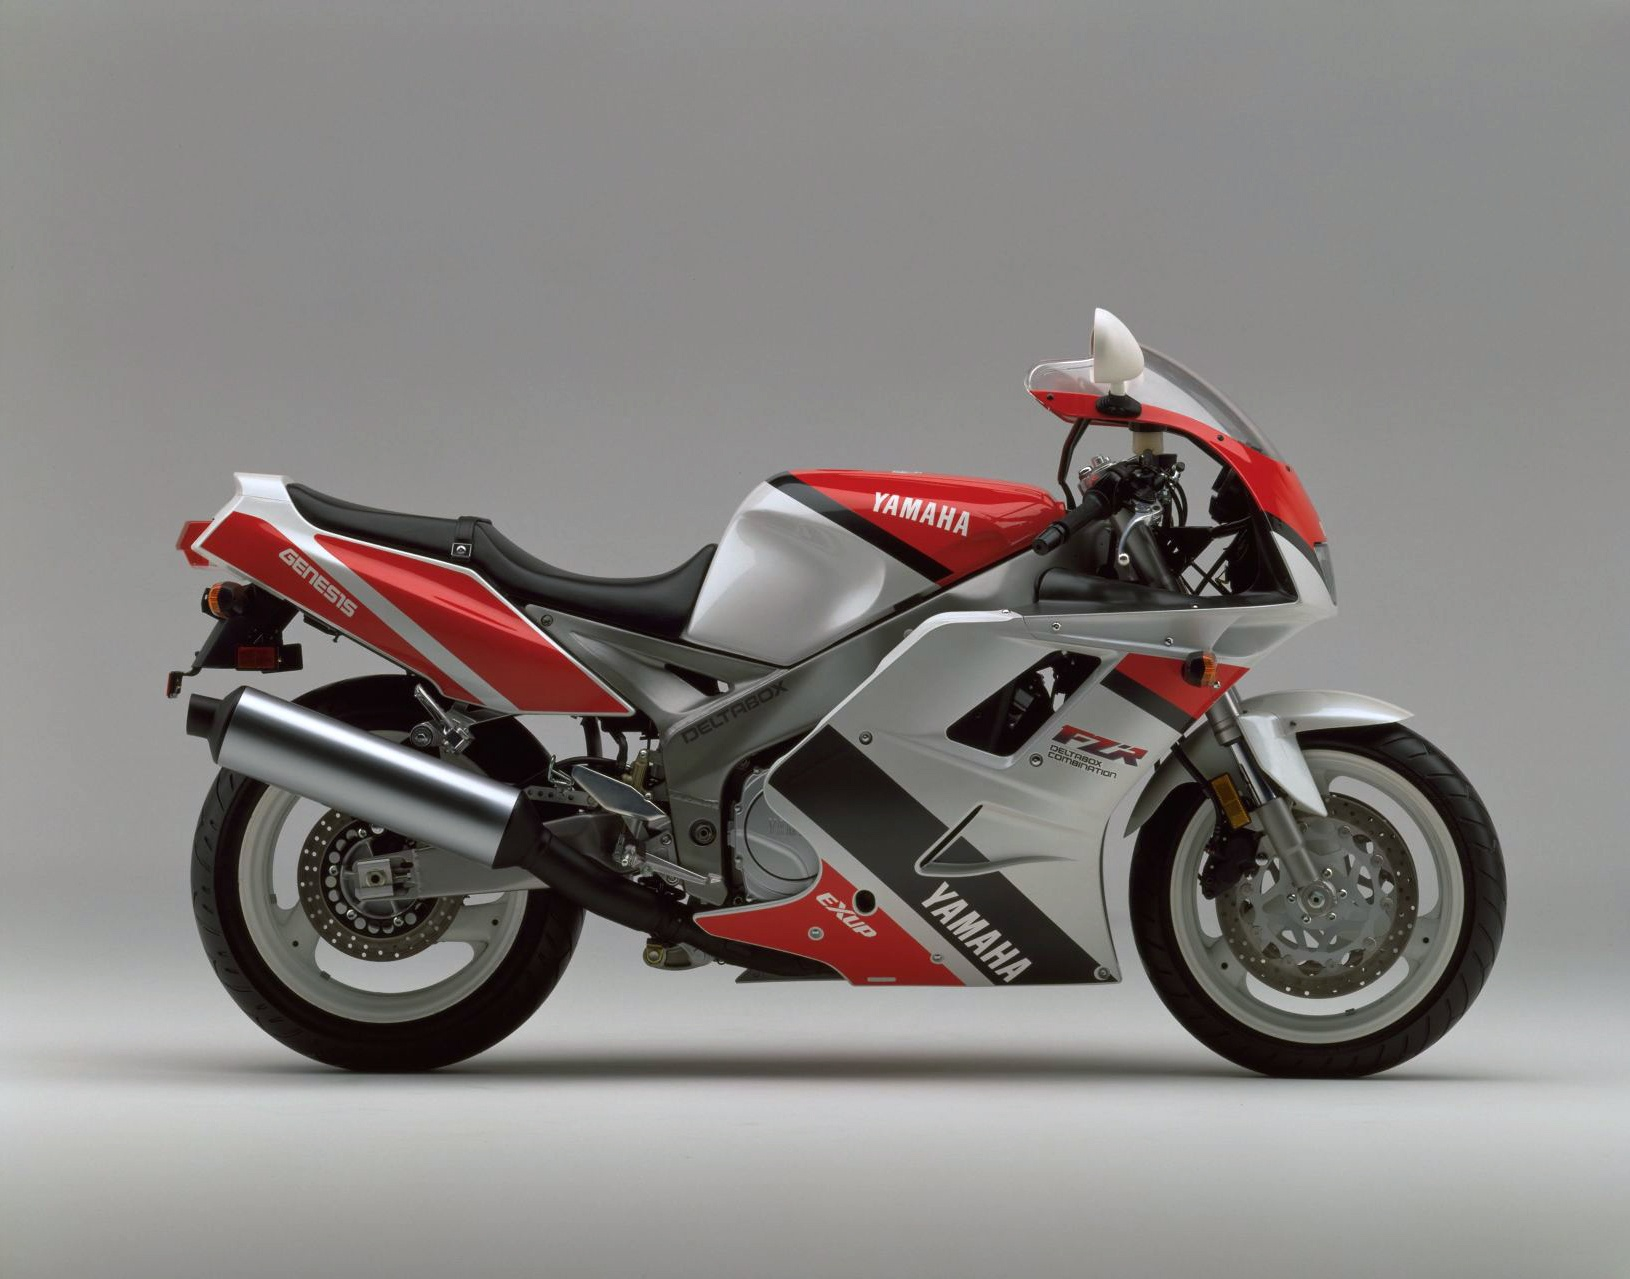 Yamaha FZR 1000 9